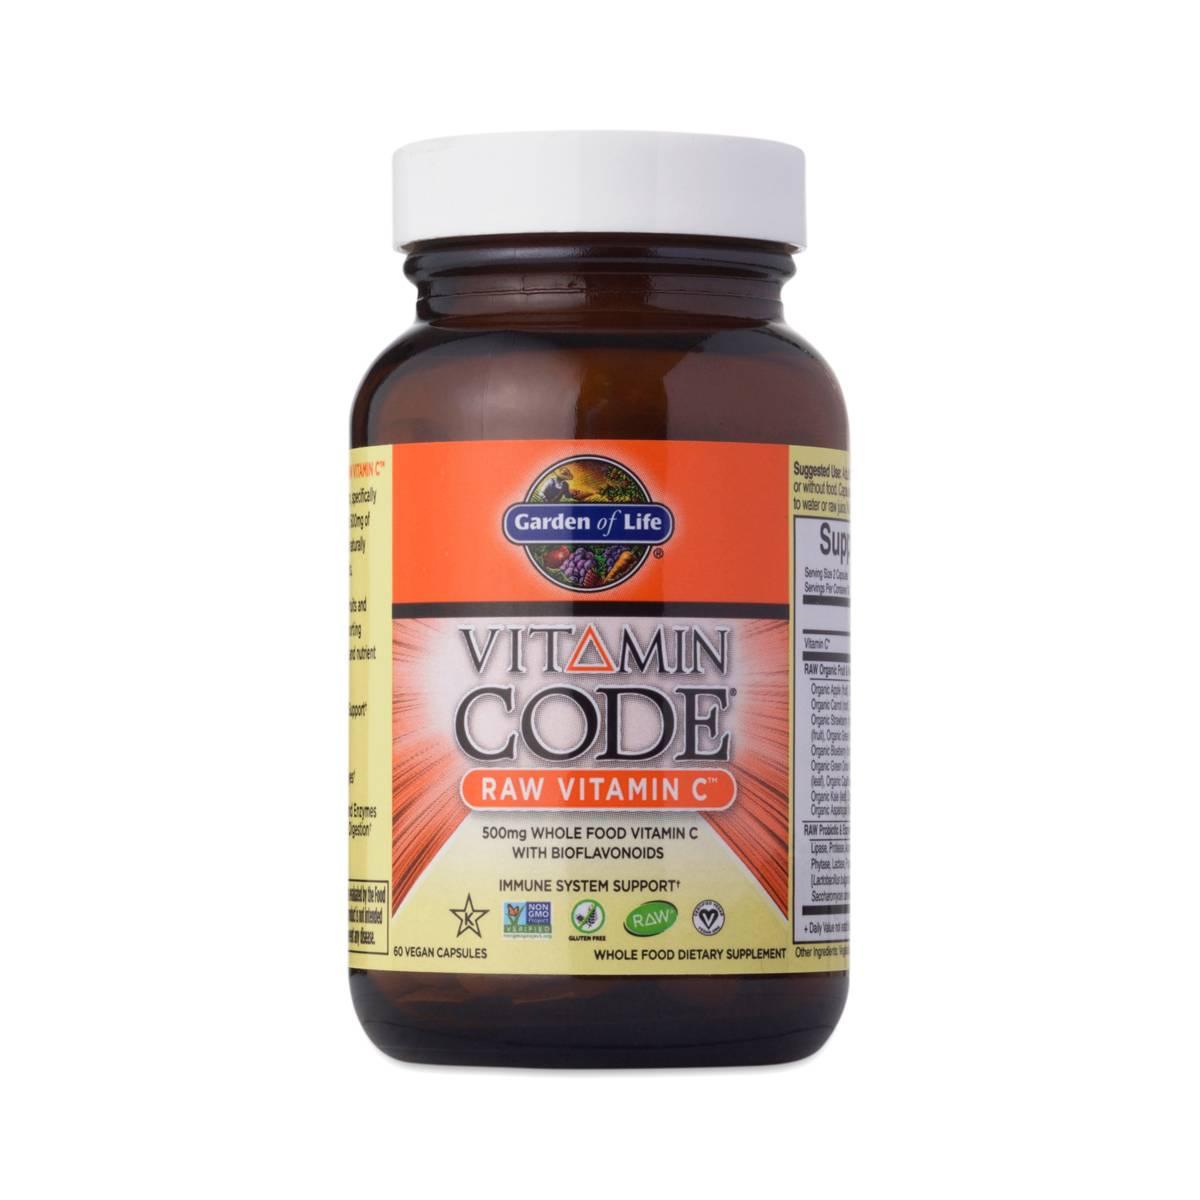 Vitamin Code Raw Vitamin C Supplement By Garden Of Life Thrive Market